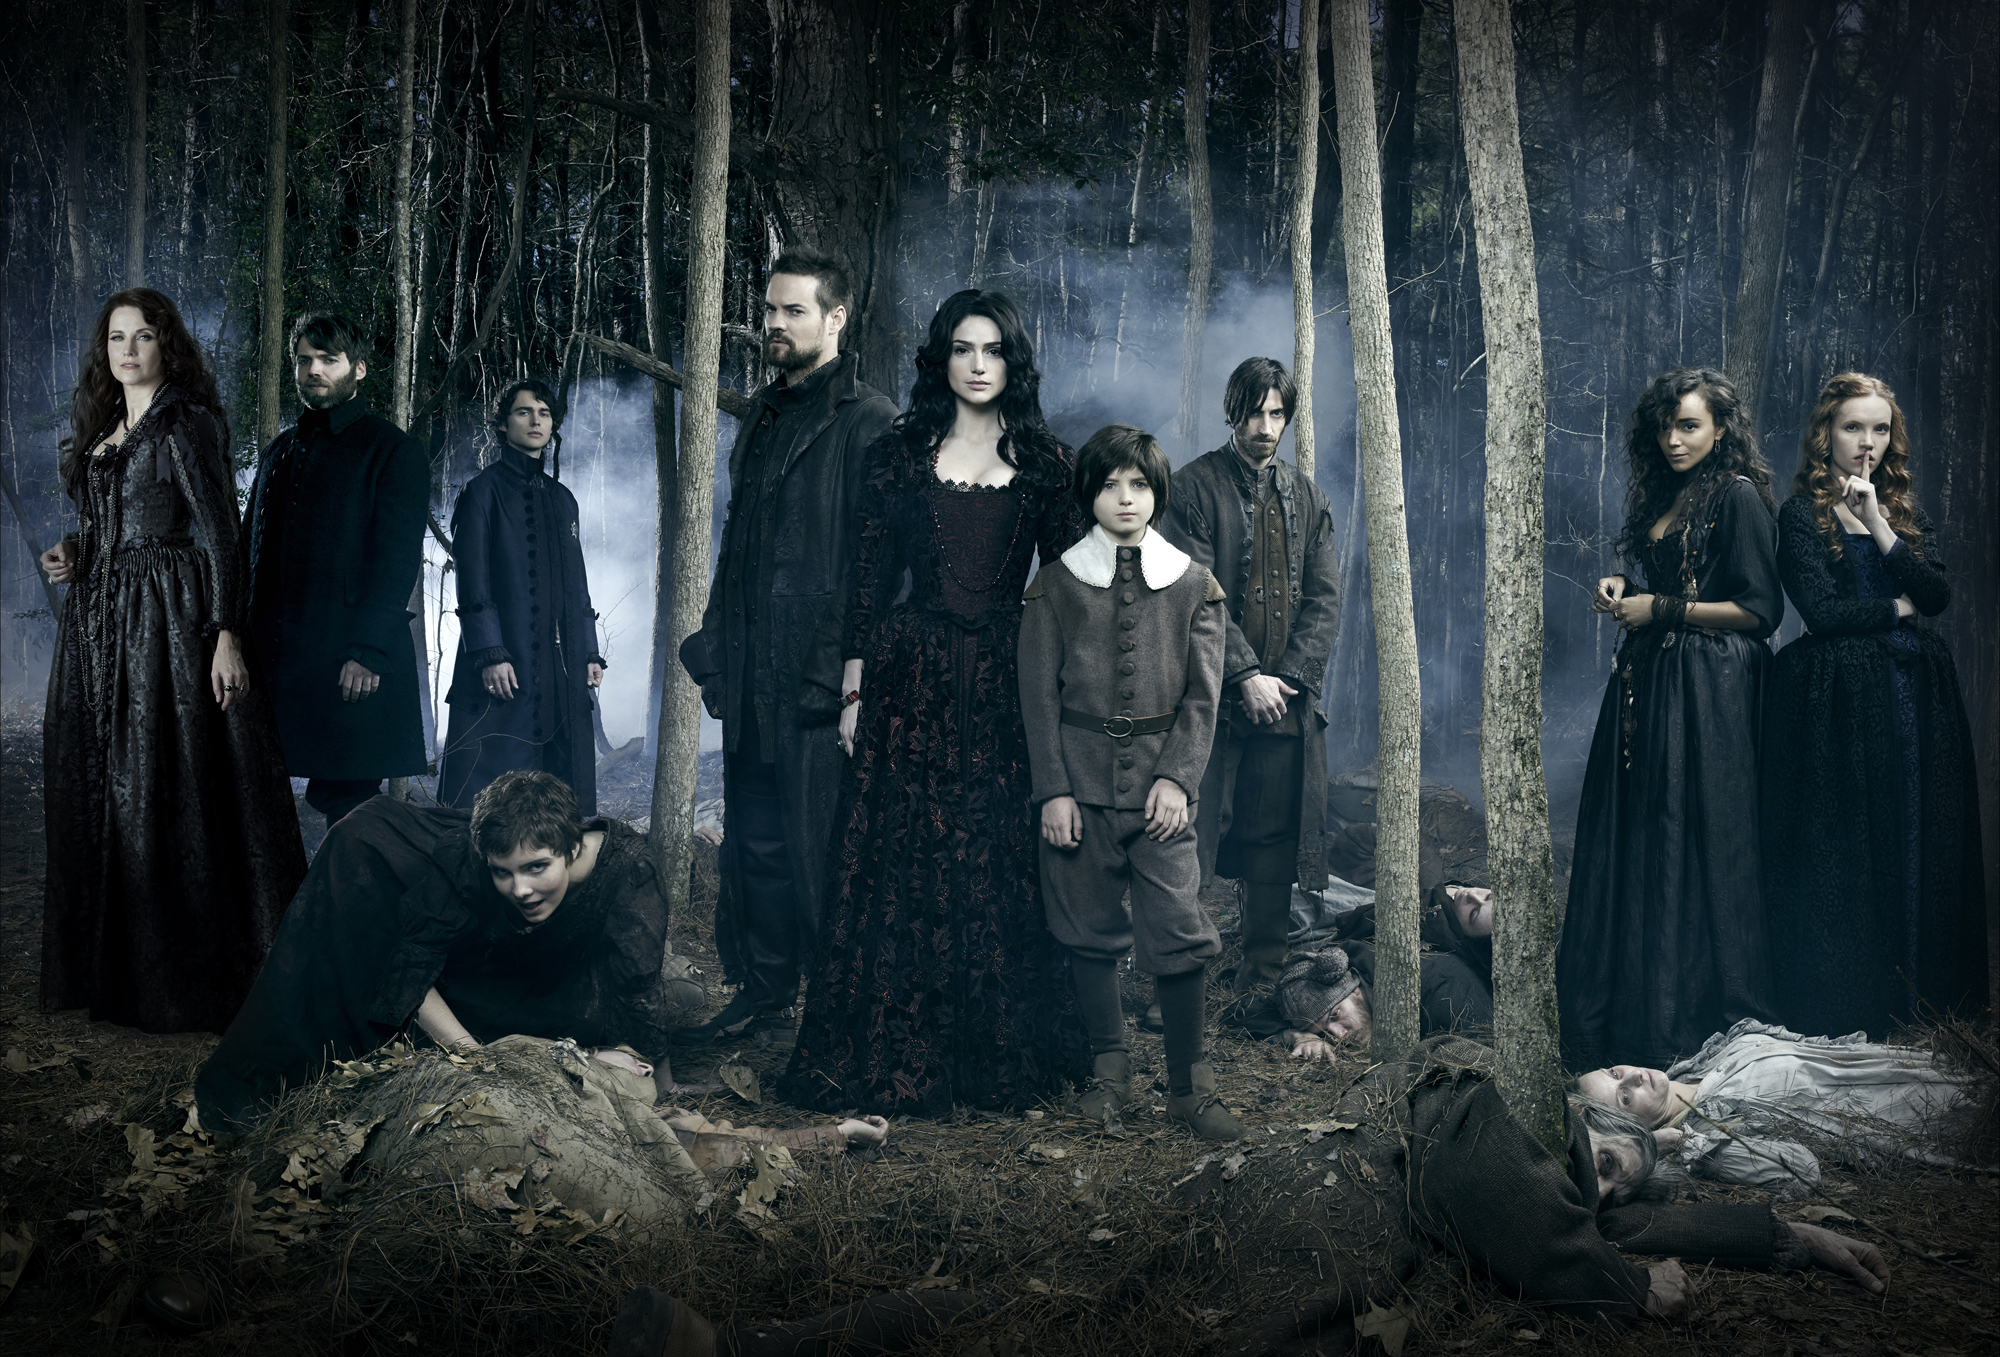 Amazon.com: Watch Salem Season 2 | Prime Video